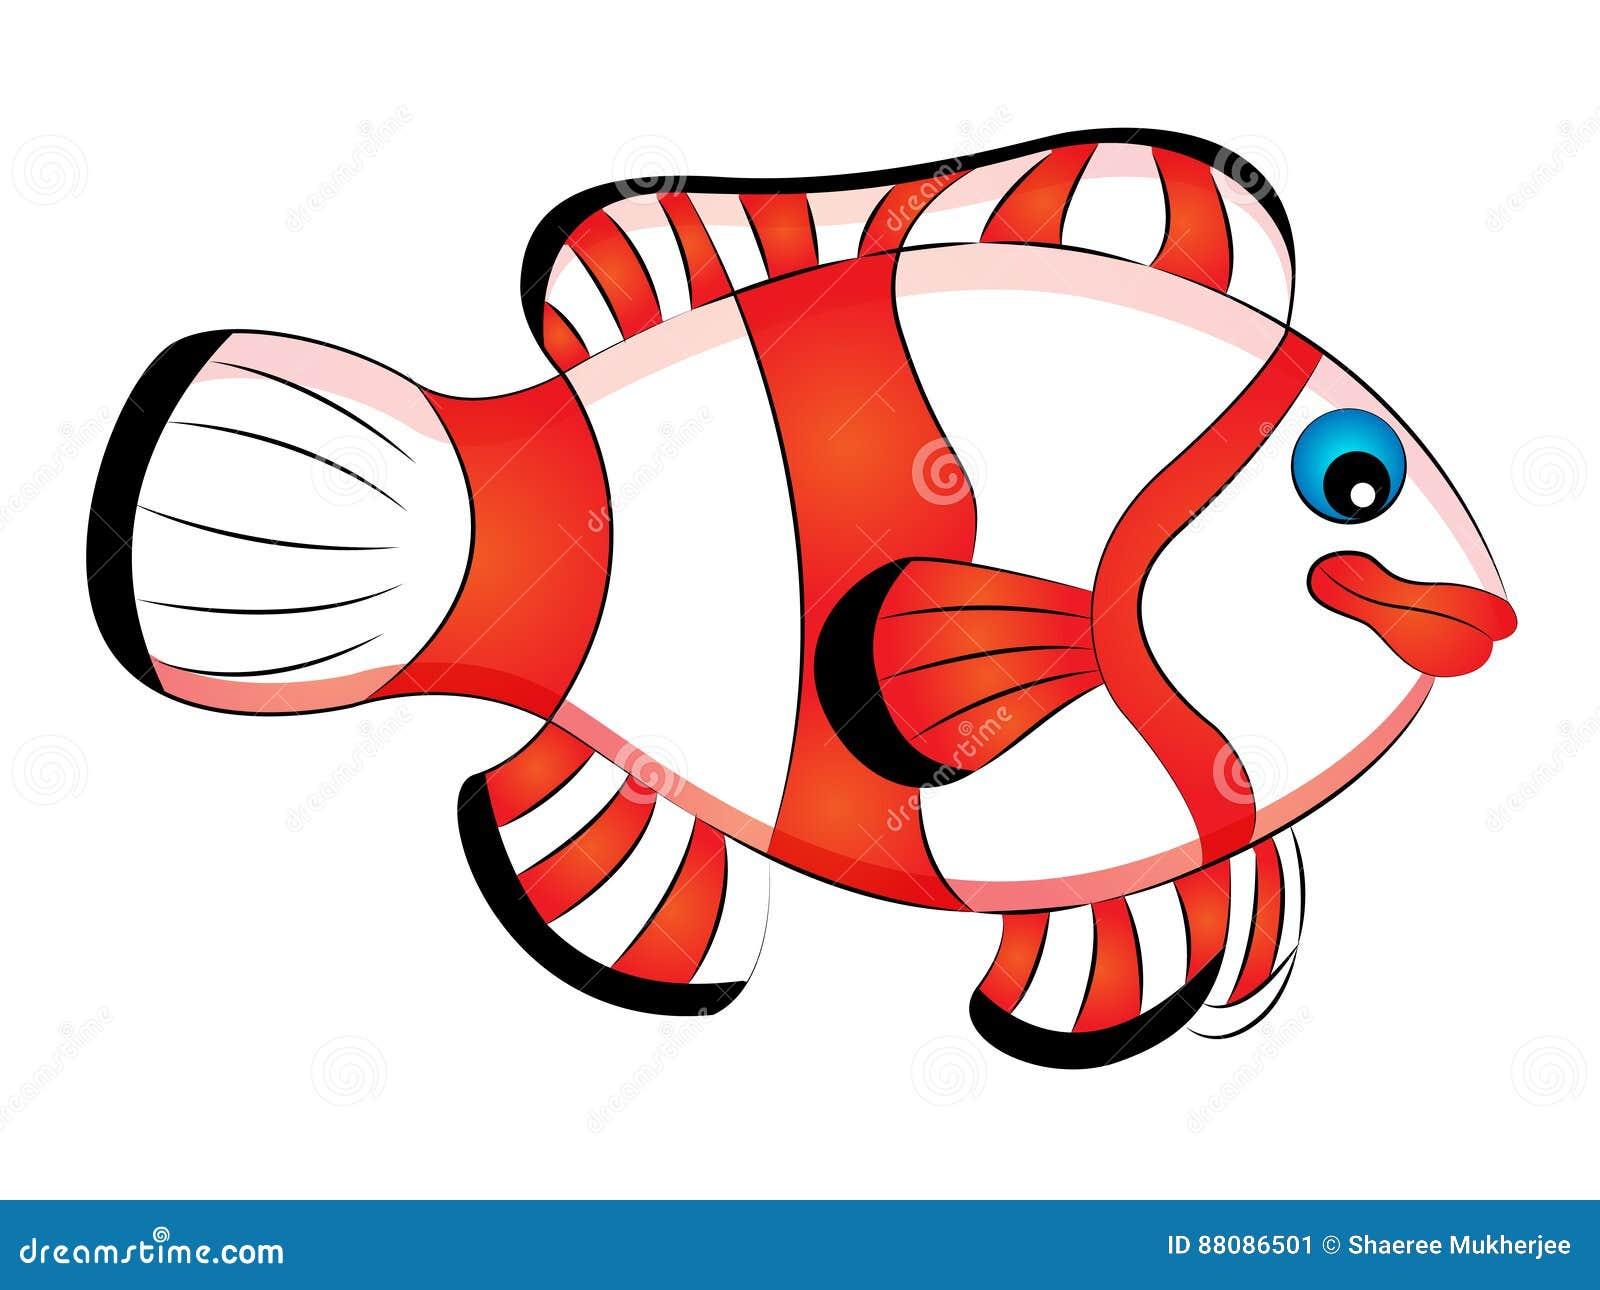 Cartoon Clown Fish Stock Vector Illustration Of Marine 88086501